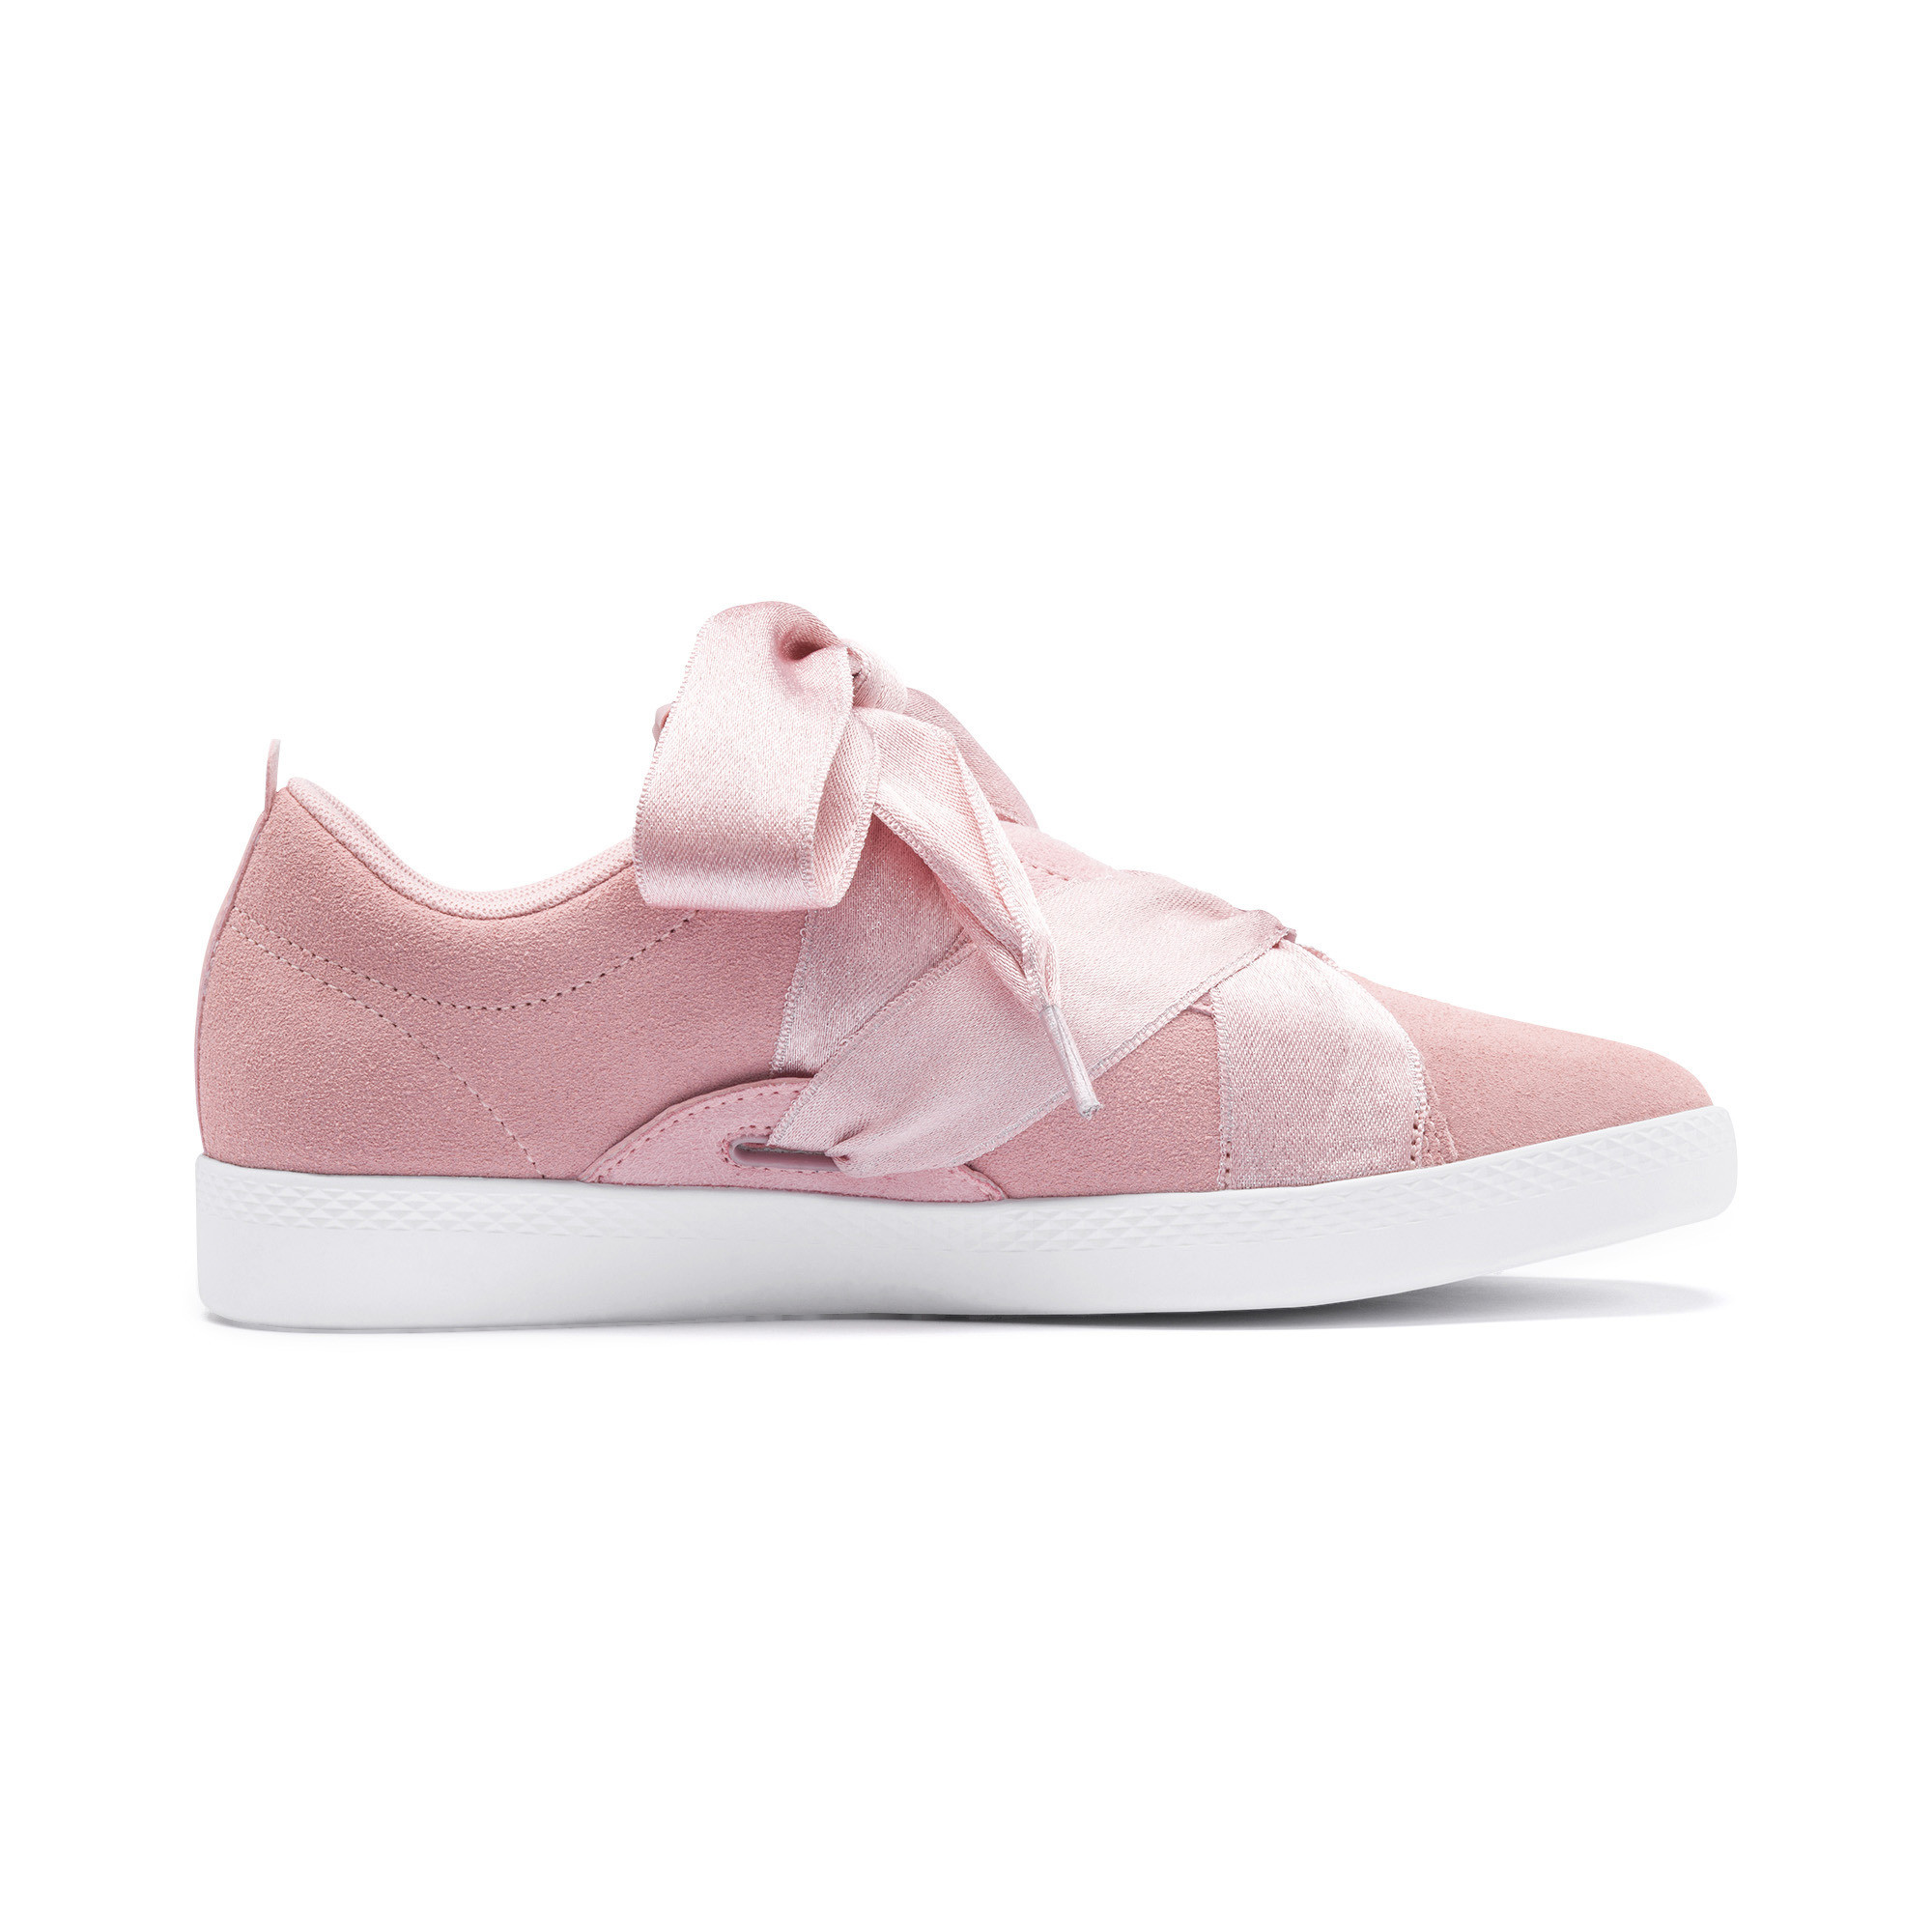 PUMA-PUMA-Smash-Astral-Buckle-Women-s-Sneakers-Women-Shoe-Basics thumbnail 7